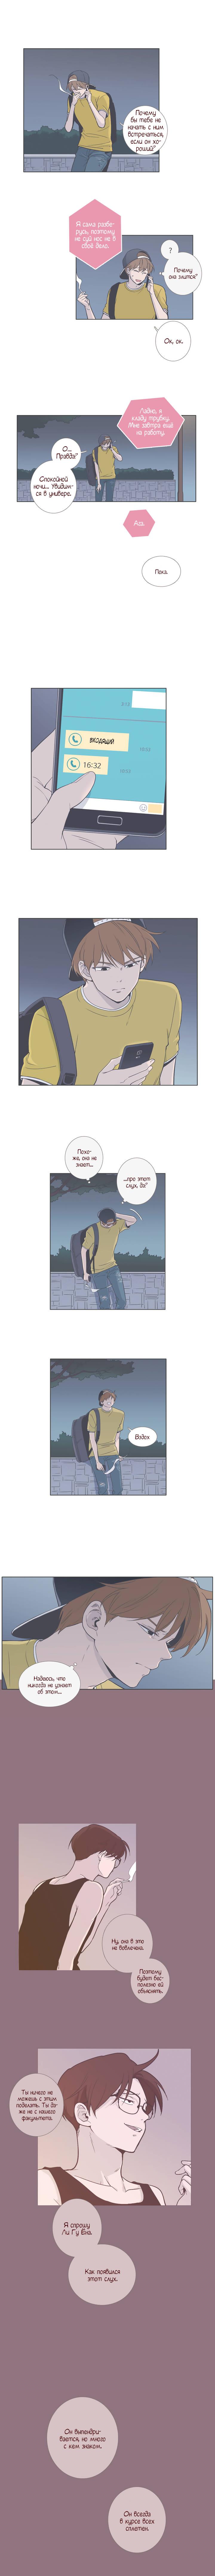 https://r1.ninemanga.com/comics/pic2/12/22860/344422/1512081517207.jpg Page 5